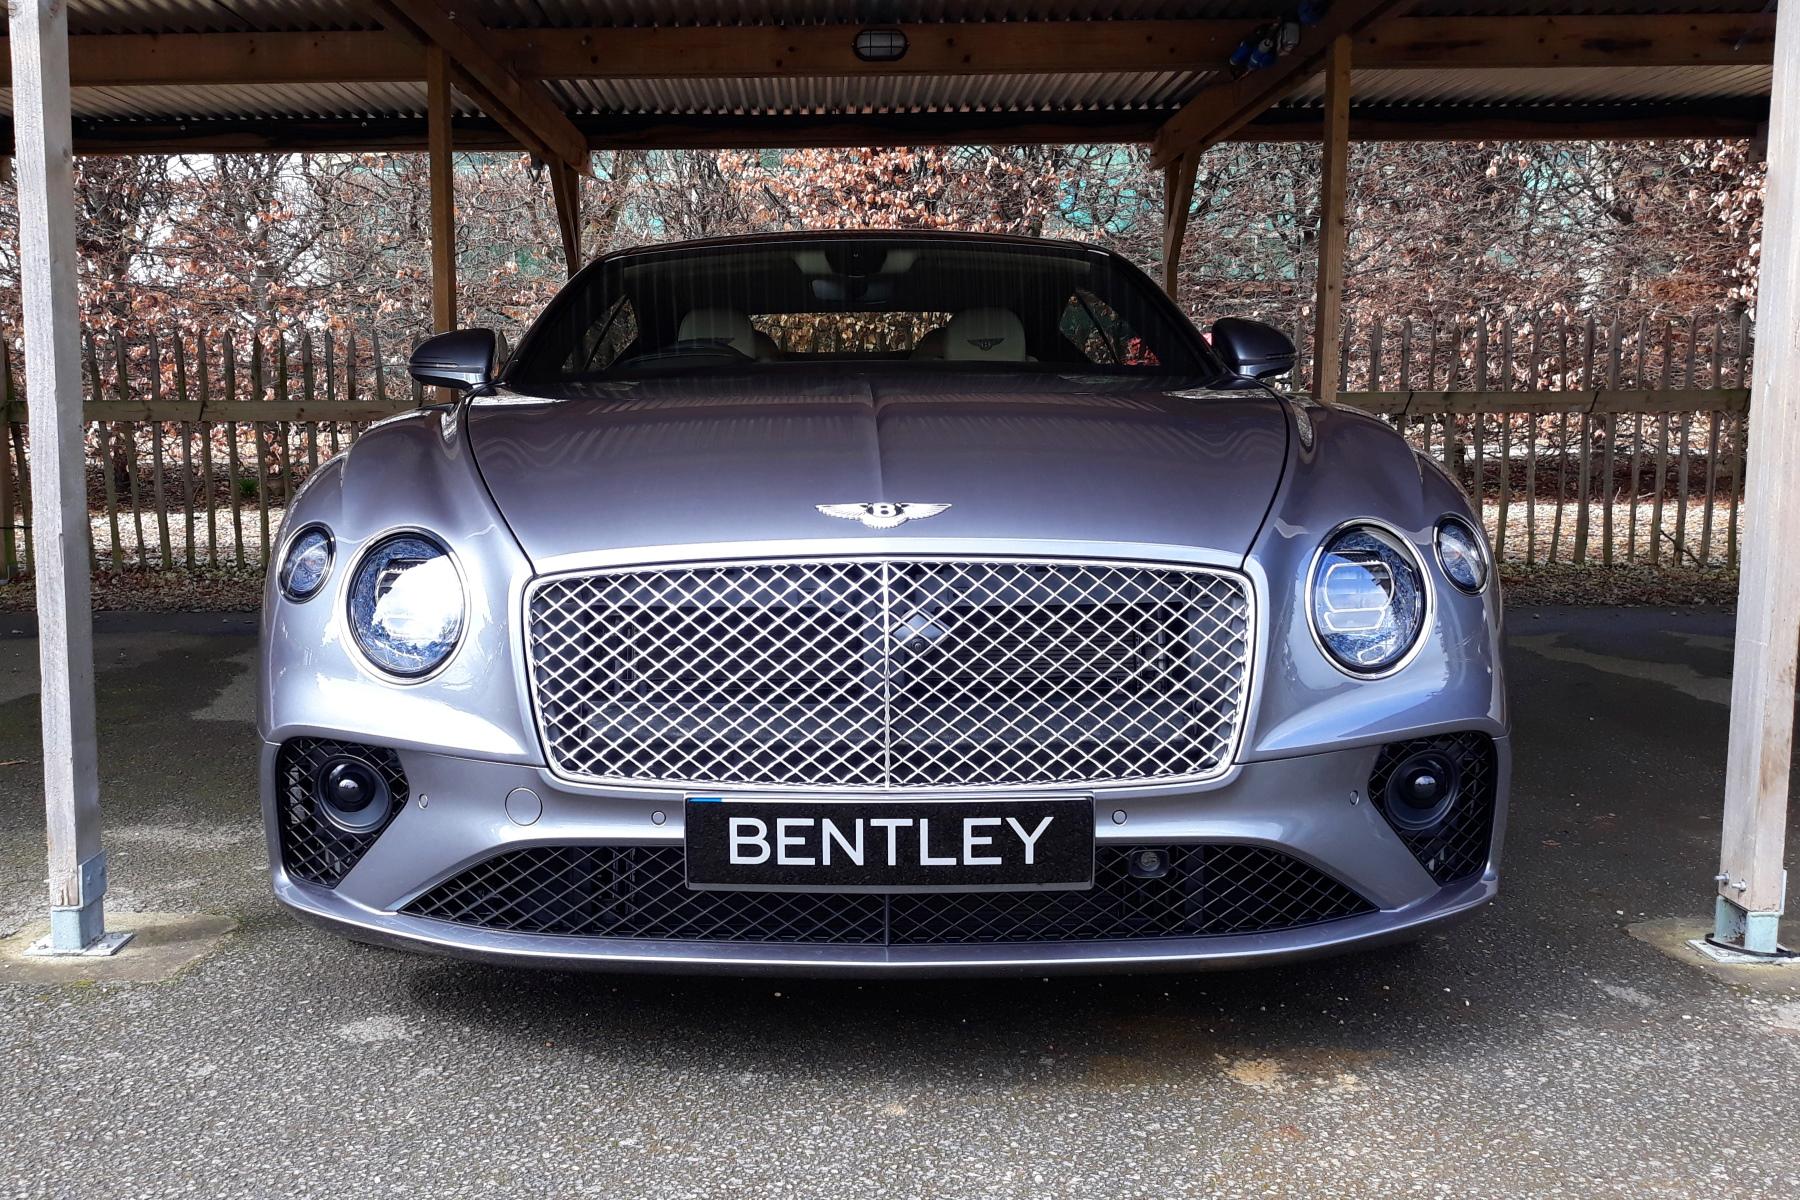 Goodwood Media Drive Day 2018 Bentley Continental GT - credit Gareth Herincx